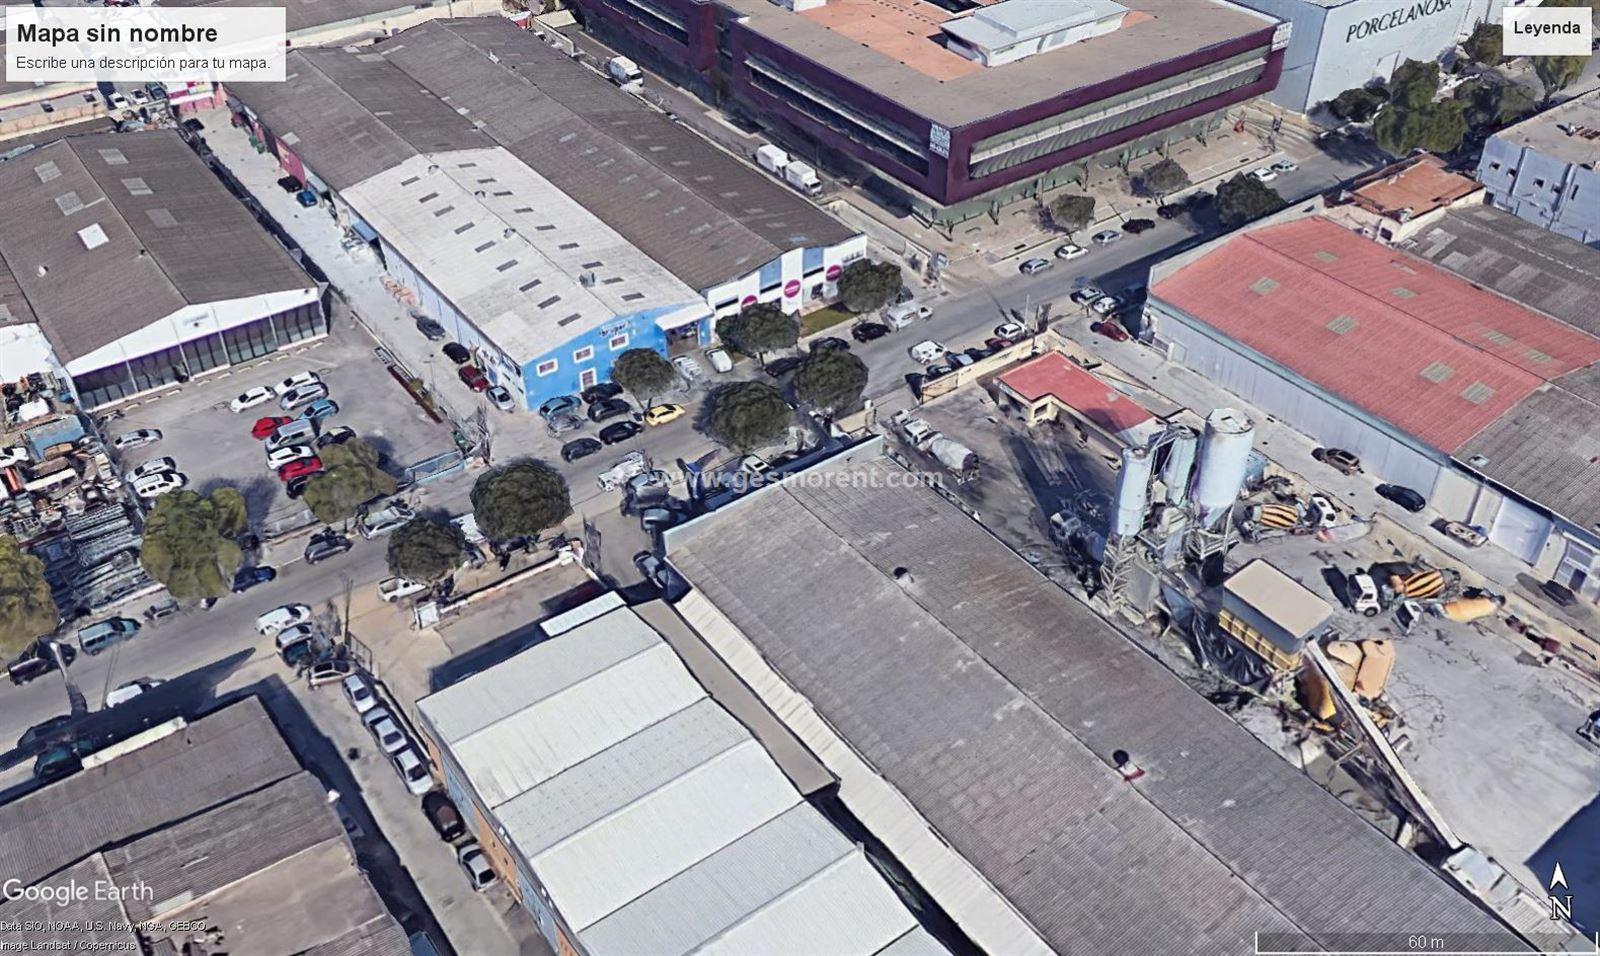 Alquiler Nave industrial  Palma de mallorca - polígono son castello. Se alquila nave industrial con zona de tienda